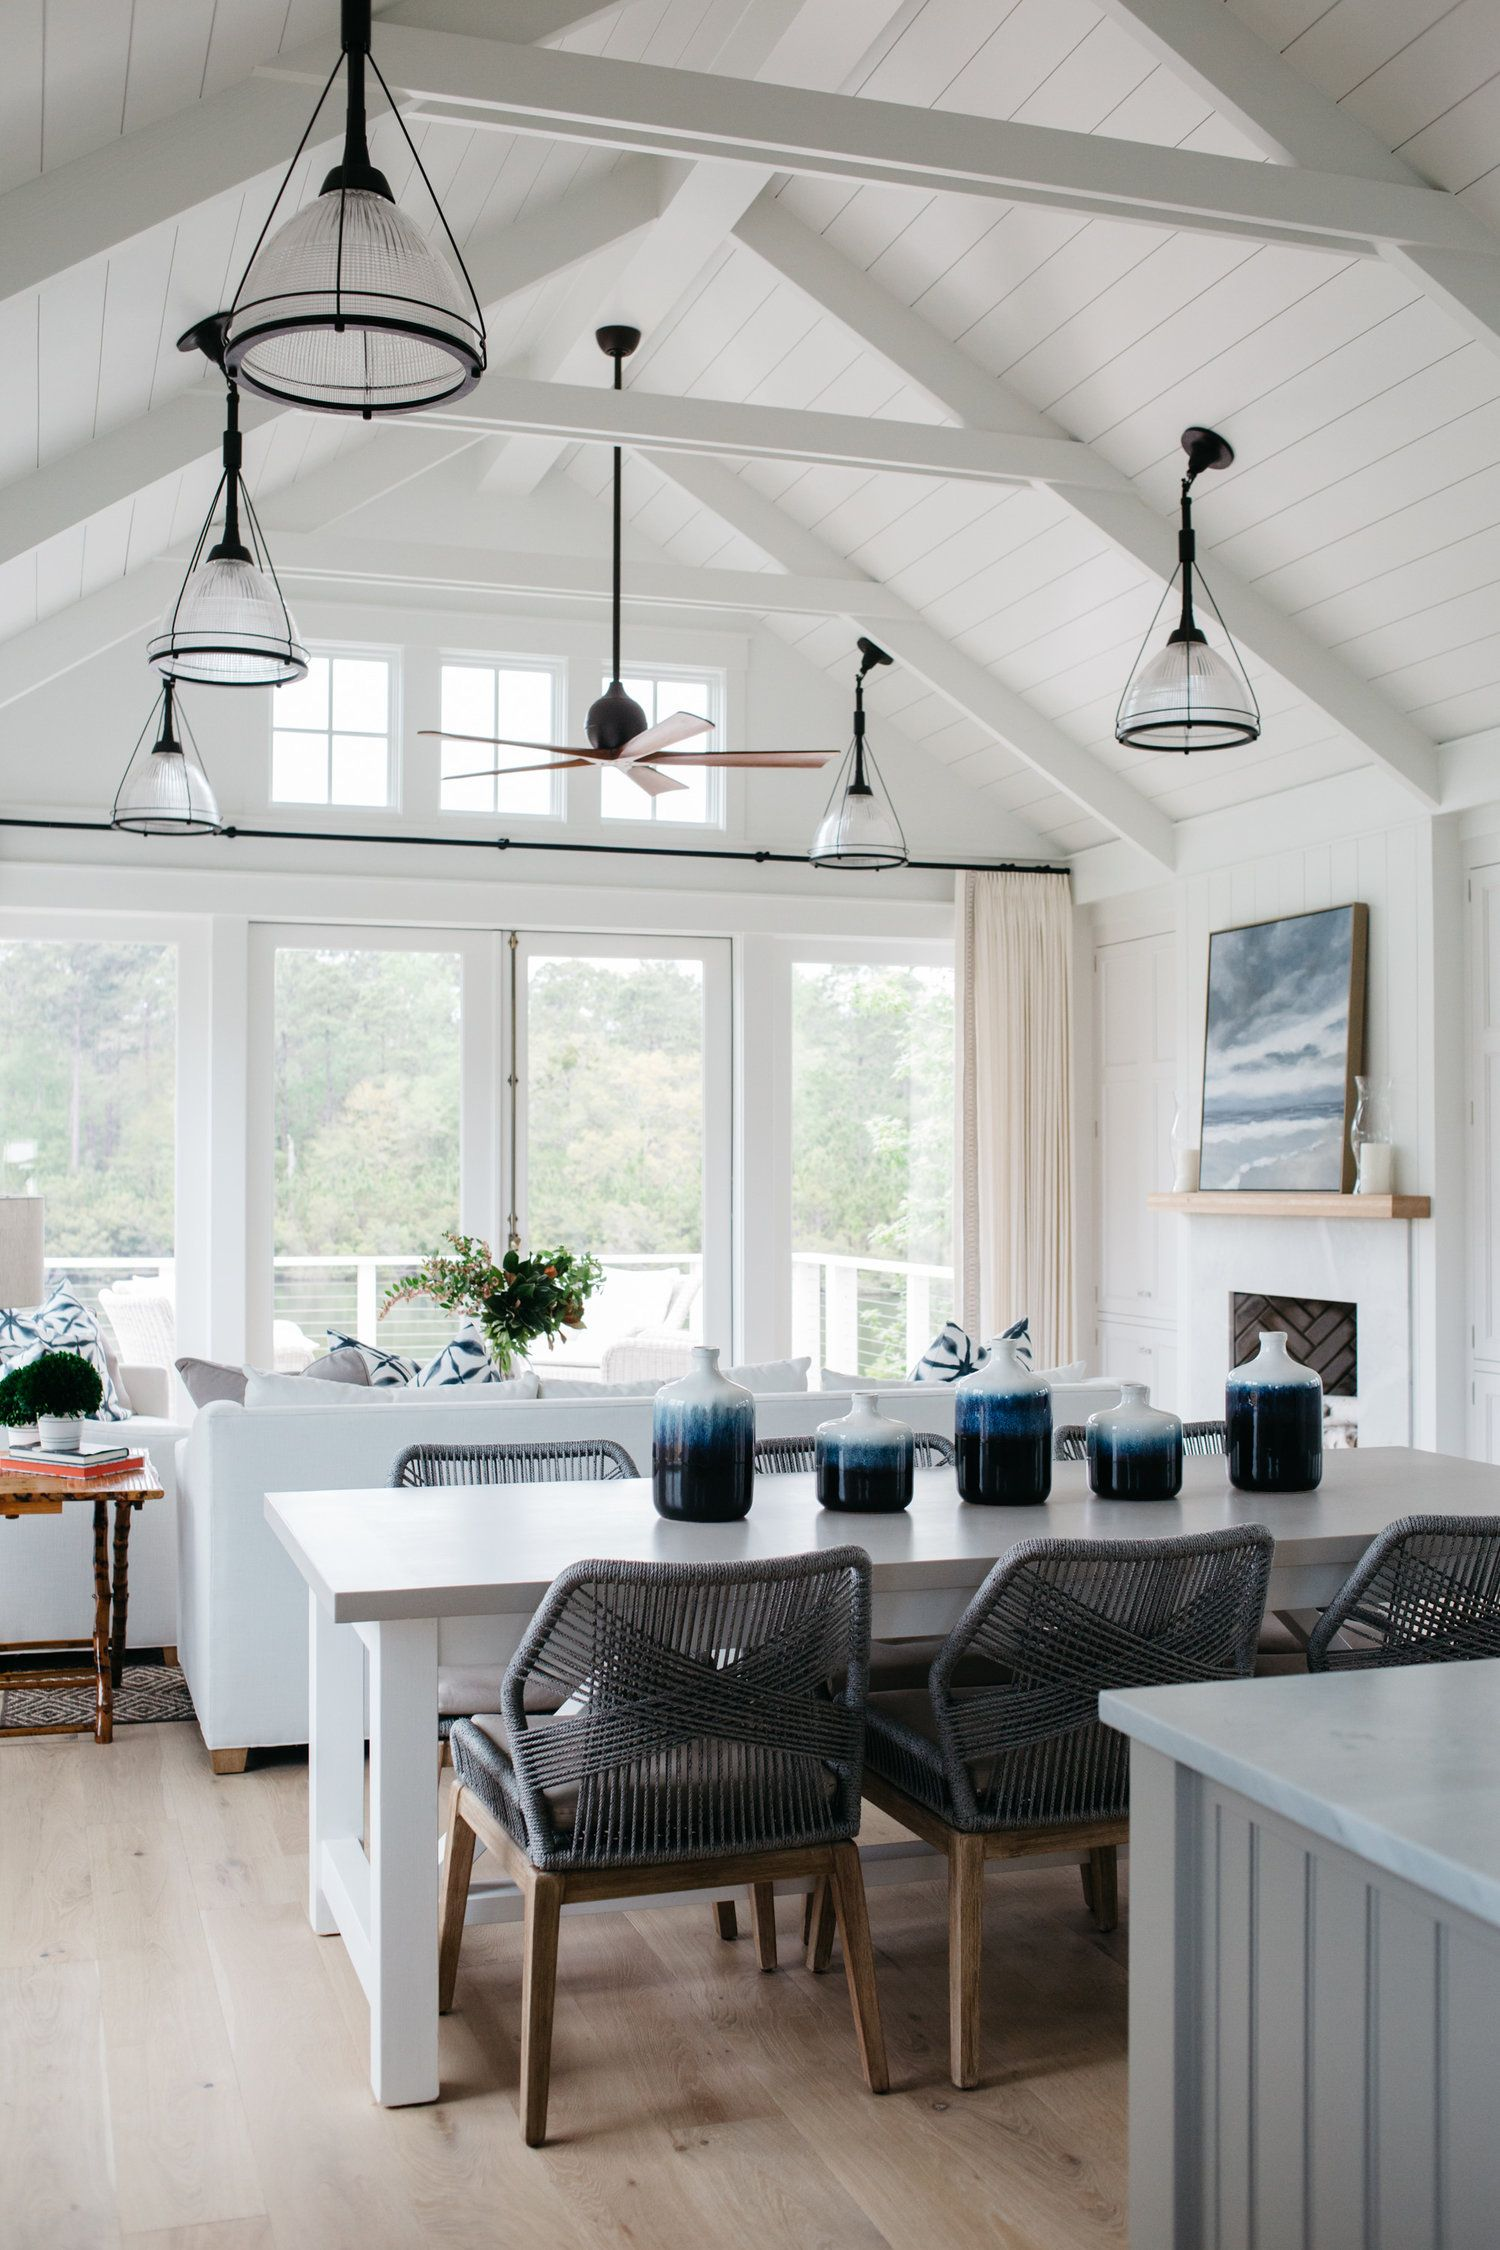 Duck Crossing Modern Farmhouse Interior Design by Lisa